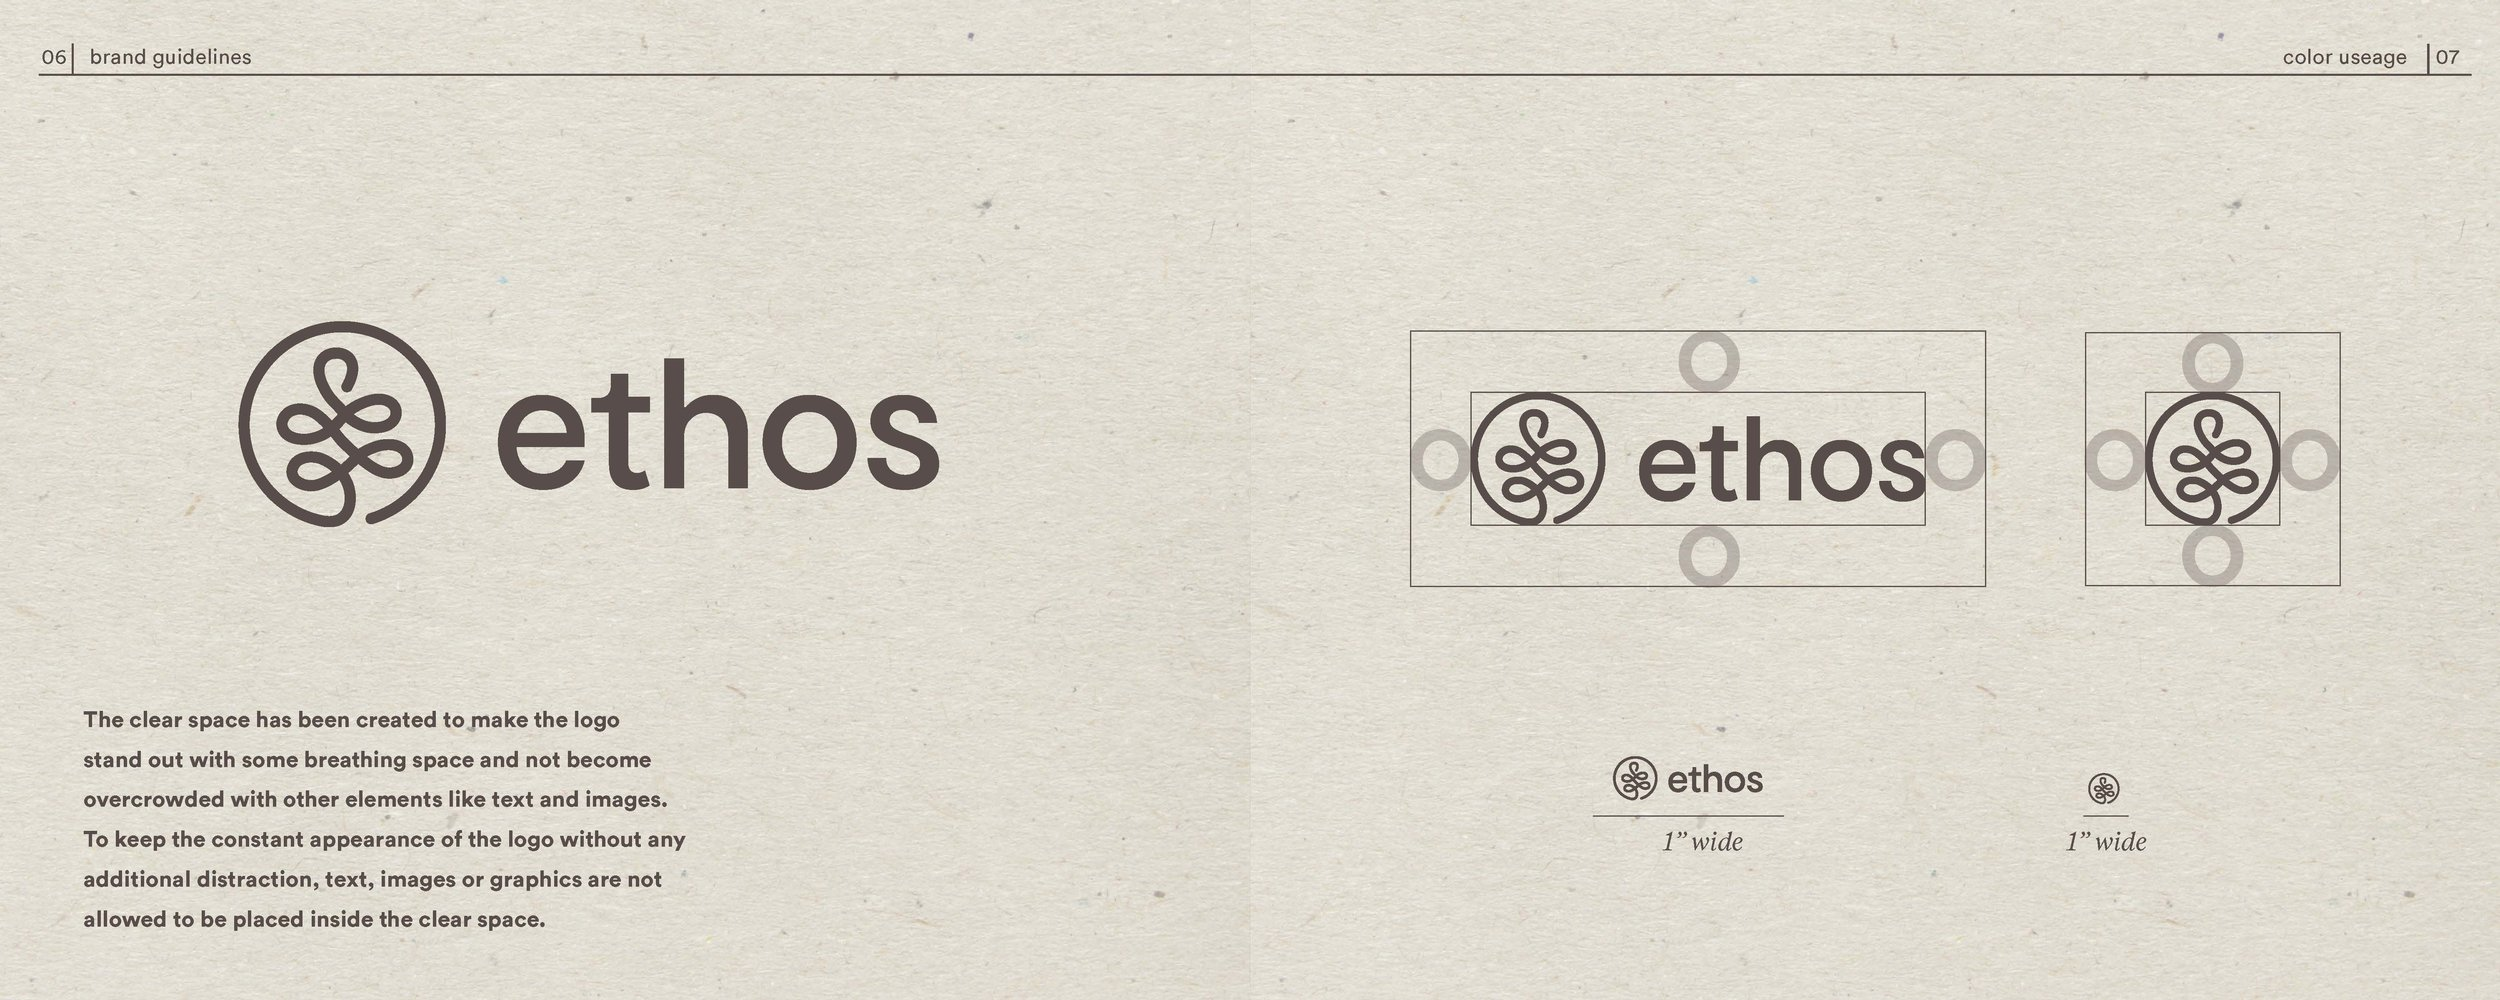 Ethos_DesignManual_Page_3.jpg